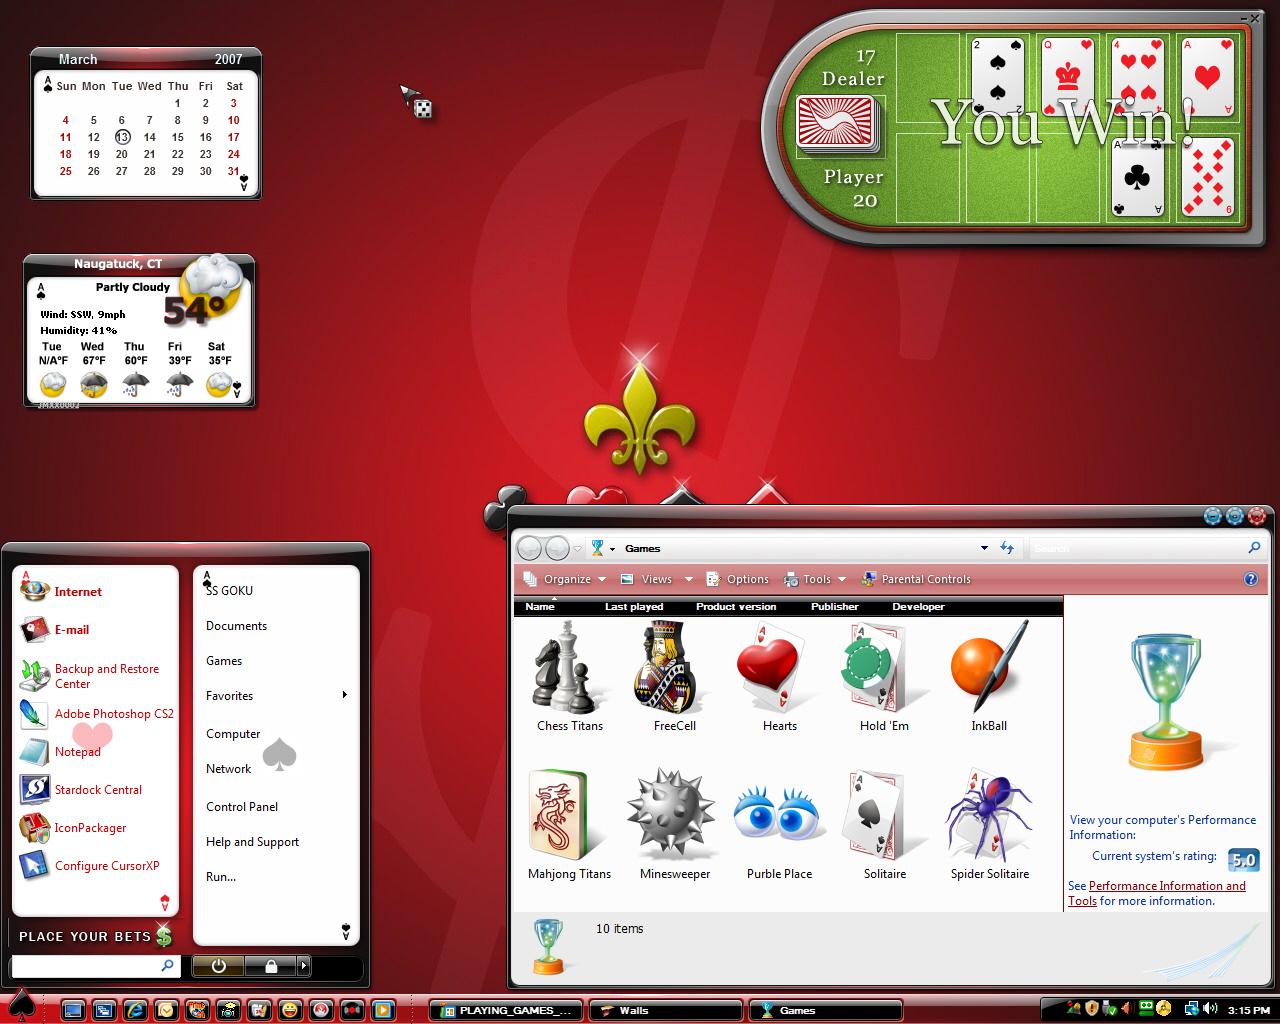 PLAYING_GAMES_VOL.10 by ssgoku-23